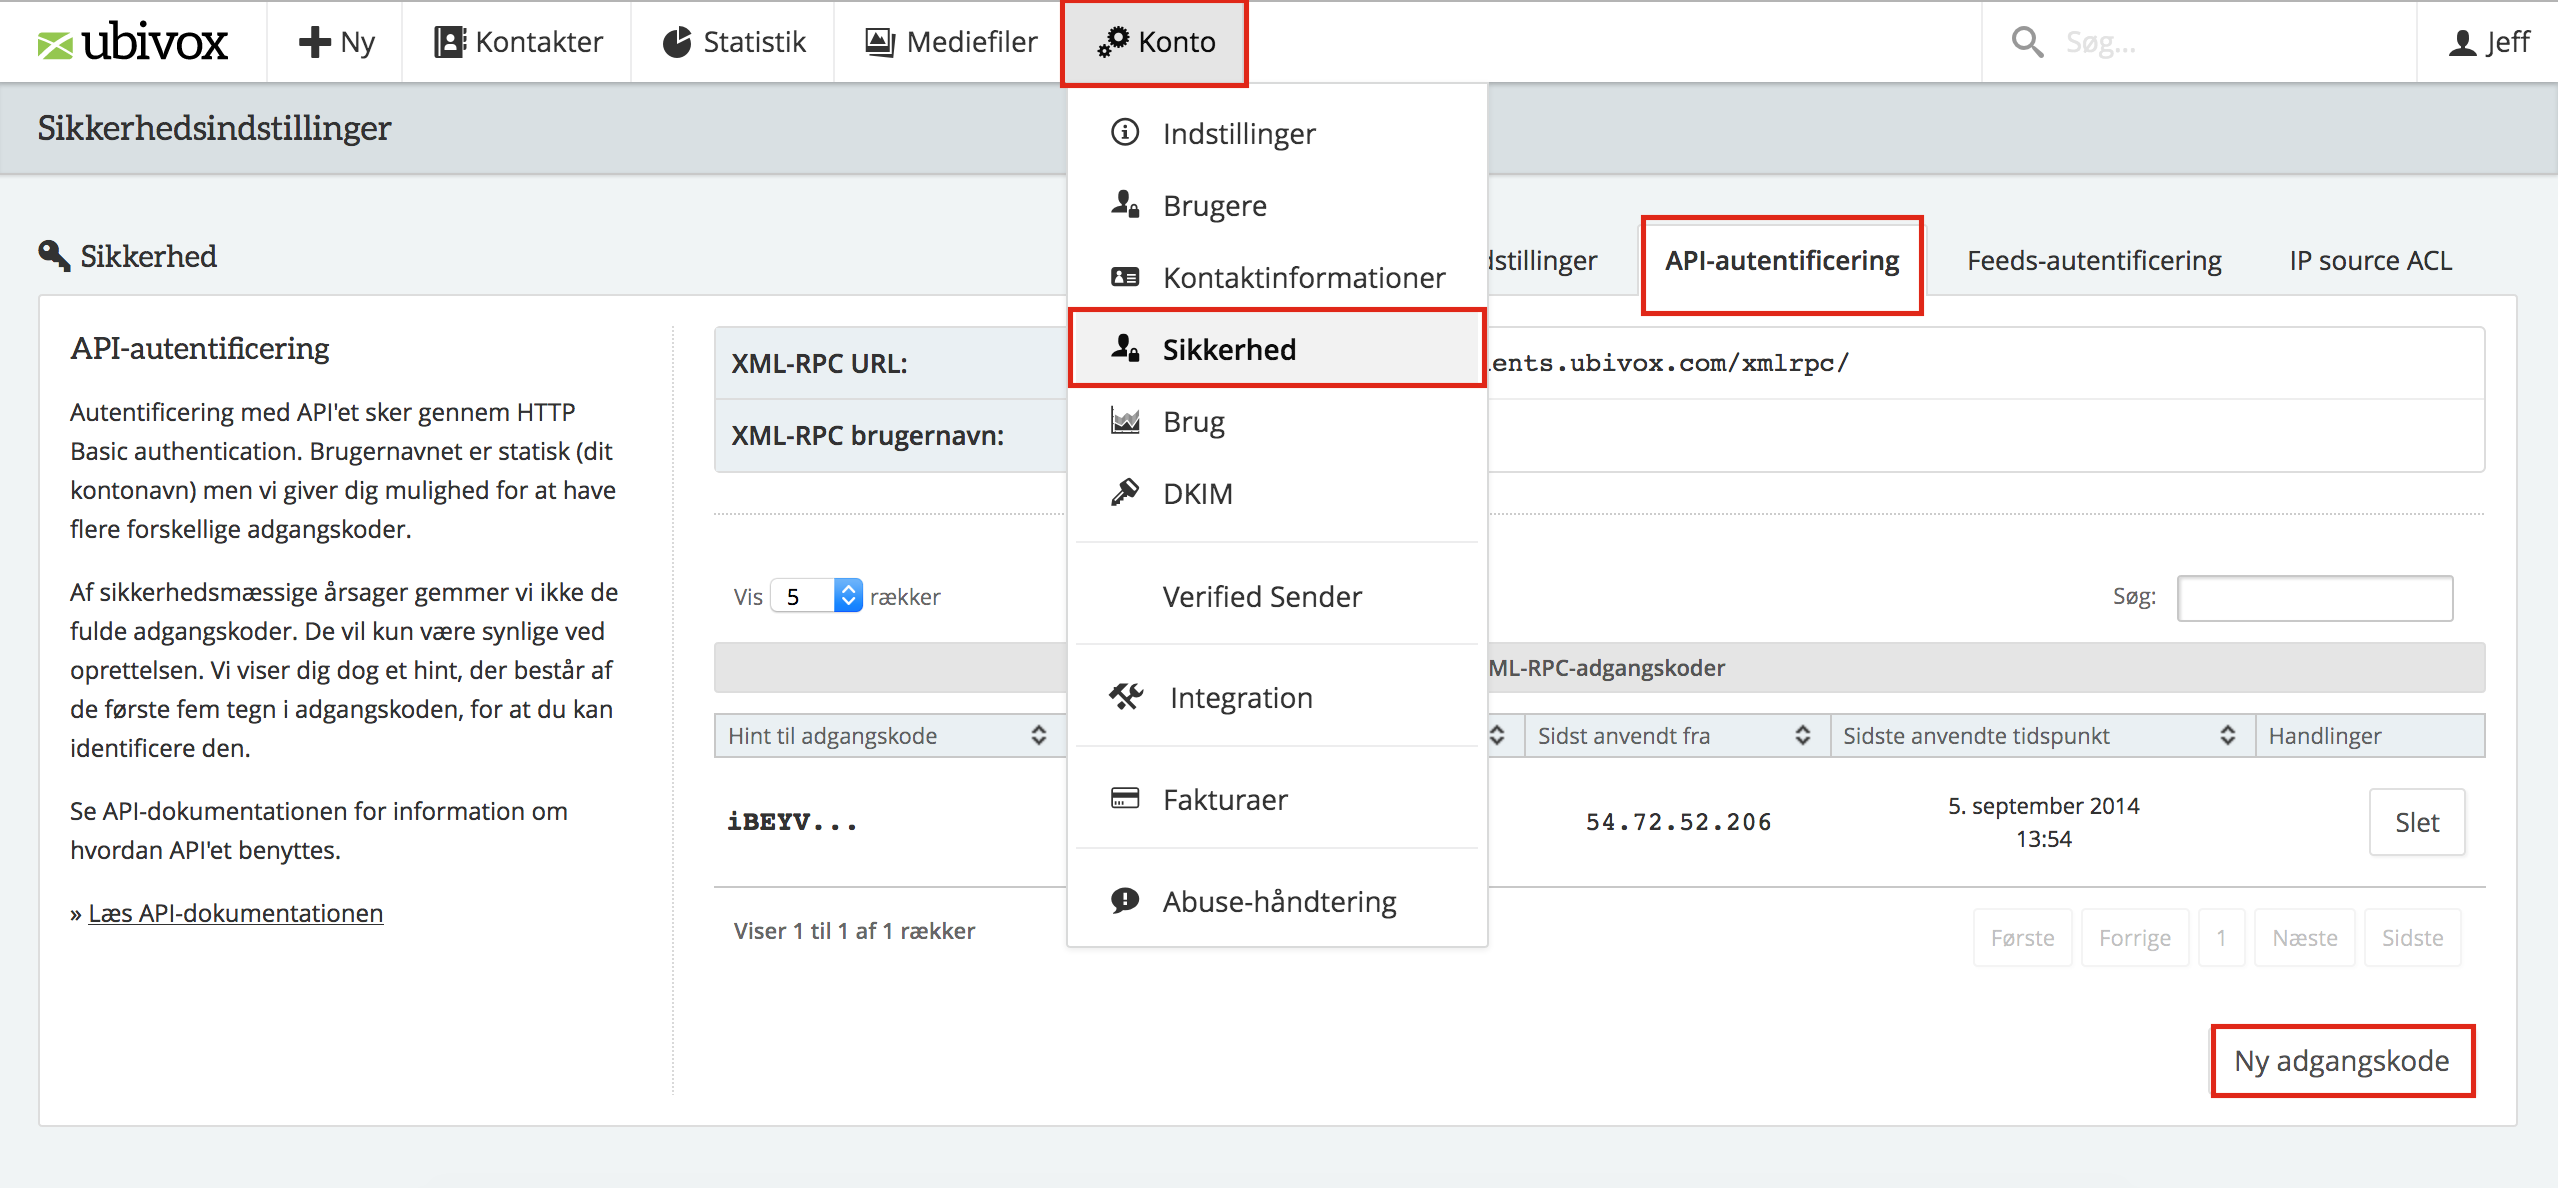 Find din API information - Ubivox Danmark Support